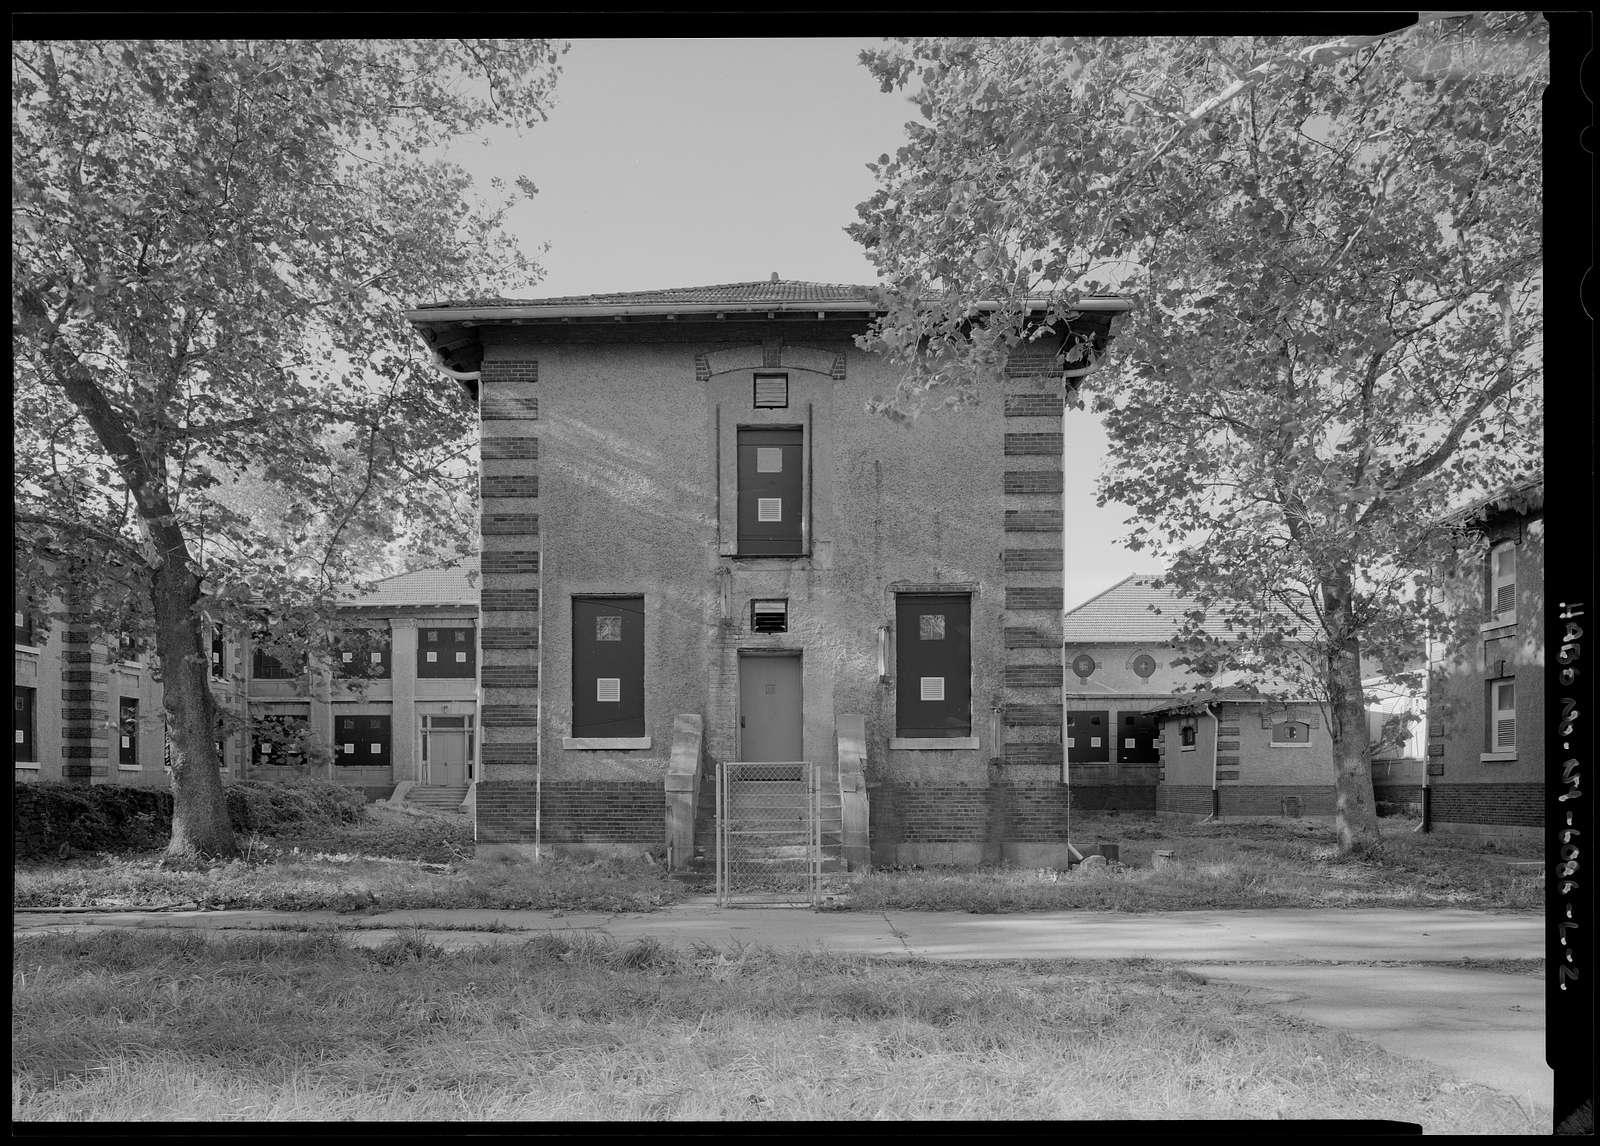 Ellis Island, Contagious Disease Hospital Measles Ward G, New York Harbor, New York, New York County, NY